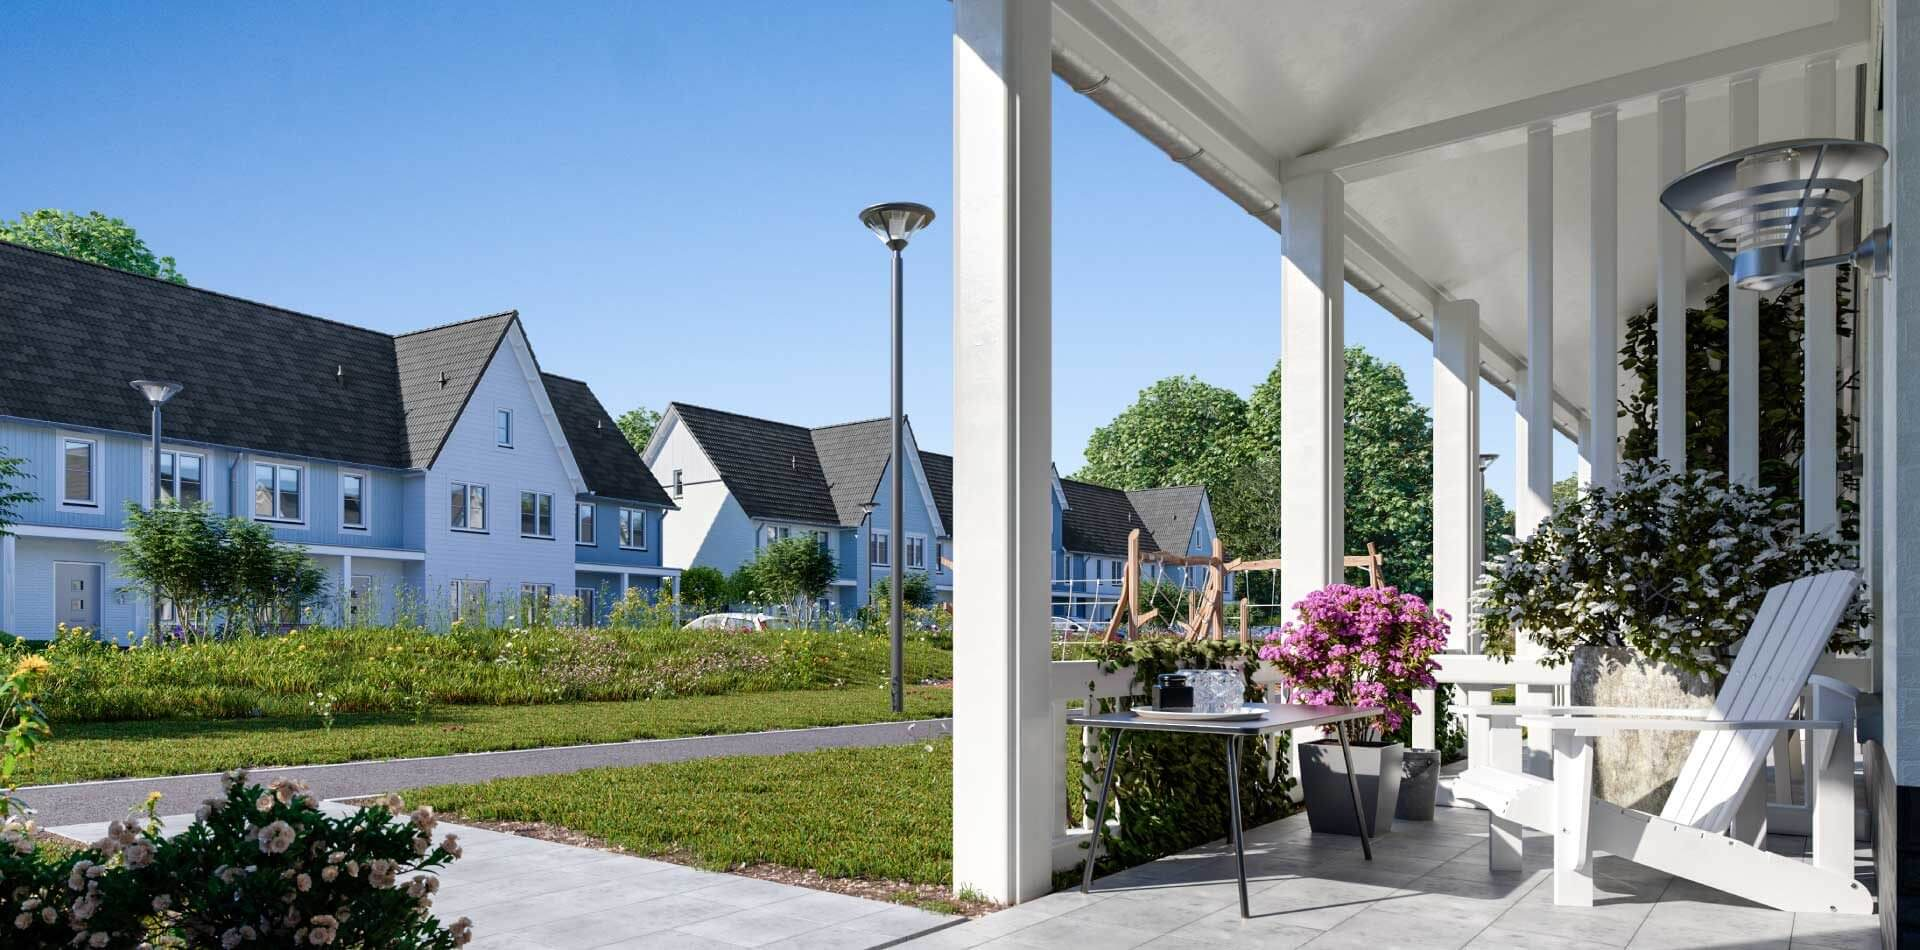 Zuiderpark-Tilburg-Werk-yoreM-nieuwbouwproject-tilburg